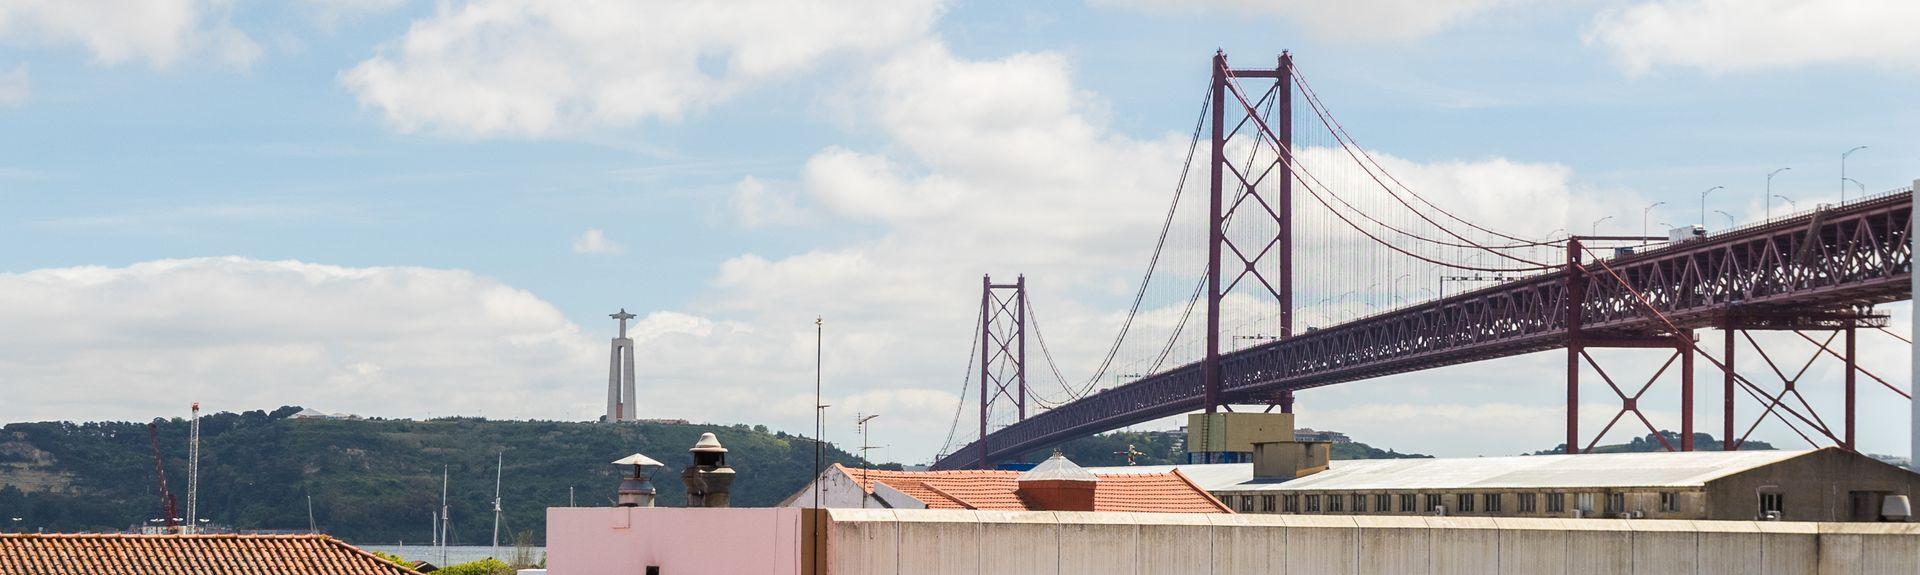 Santo Condestável, Portugal